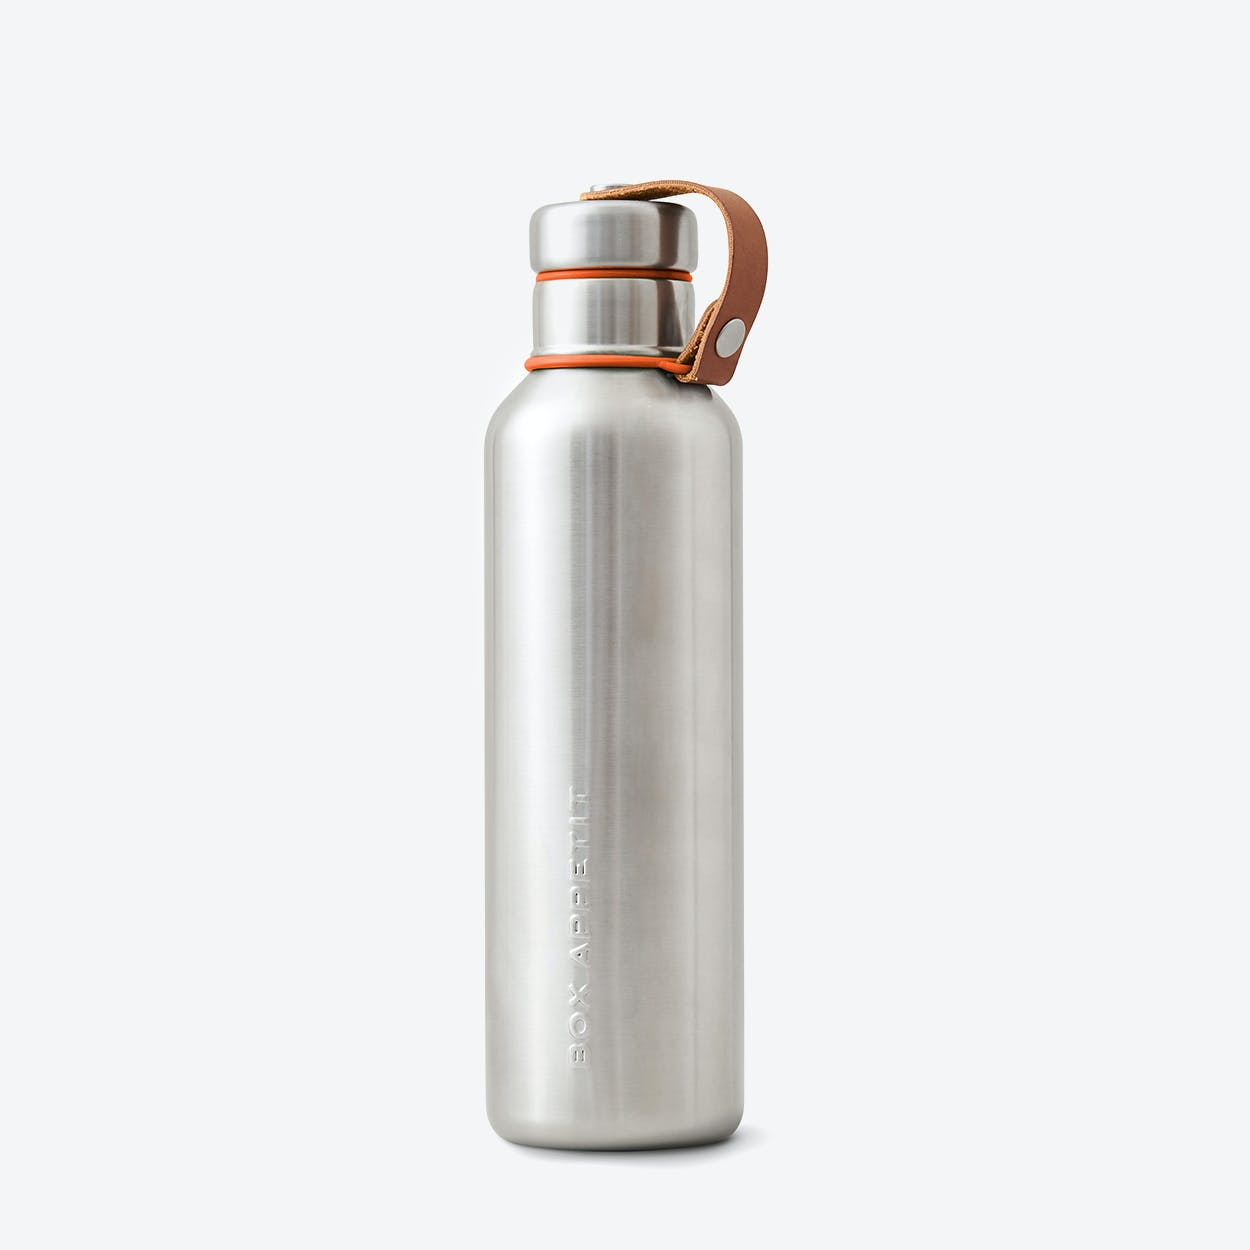 Large Insulated Water Bottle - Orange